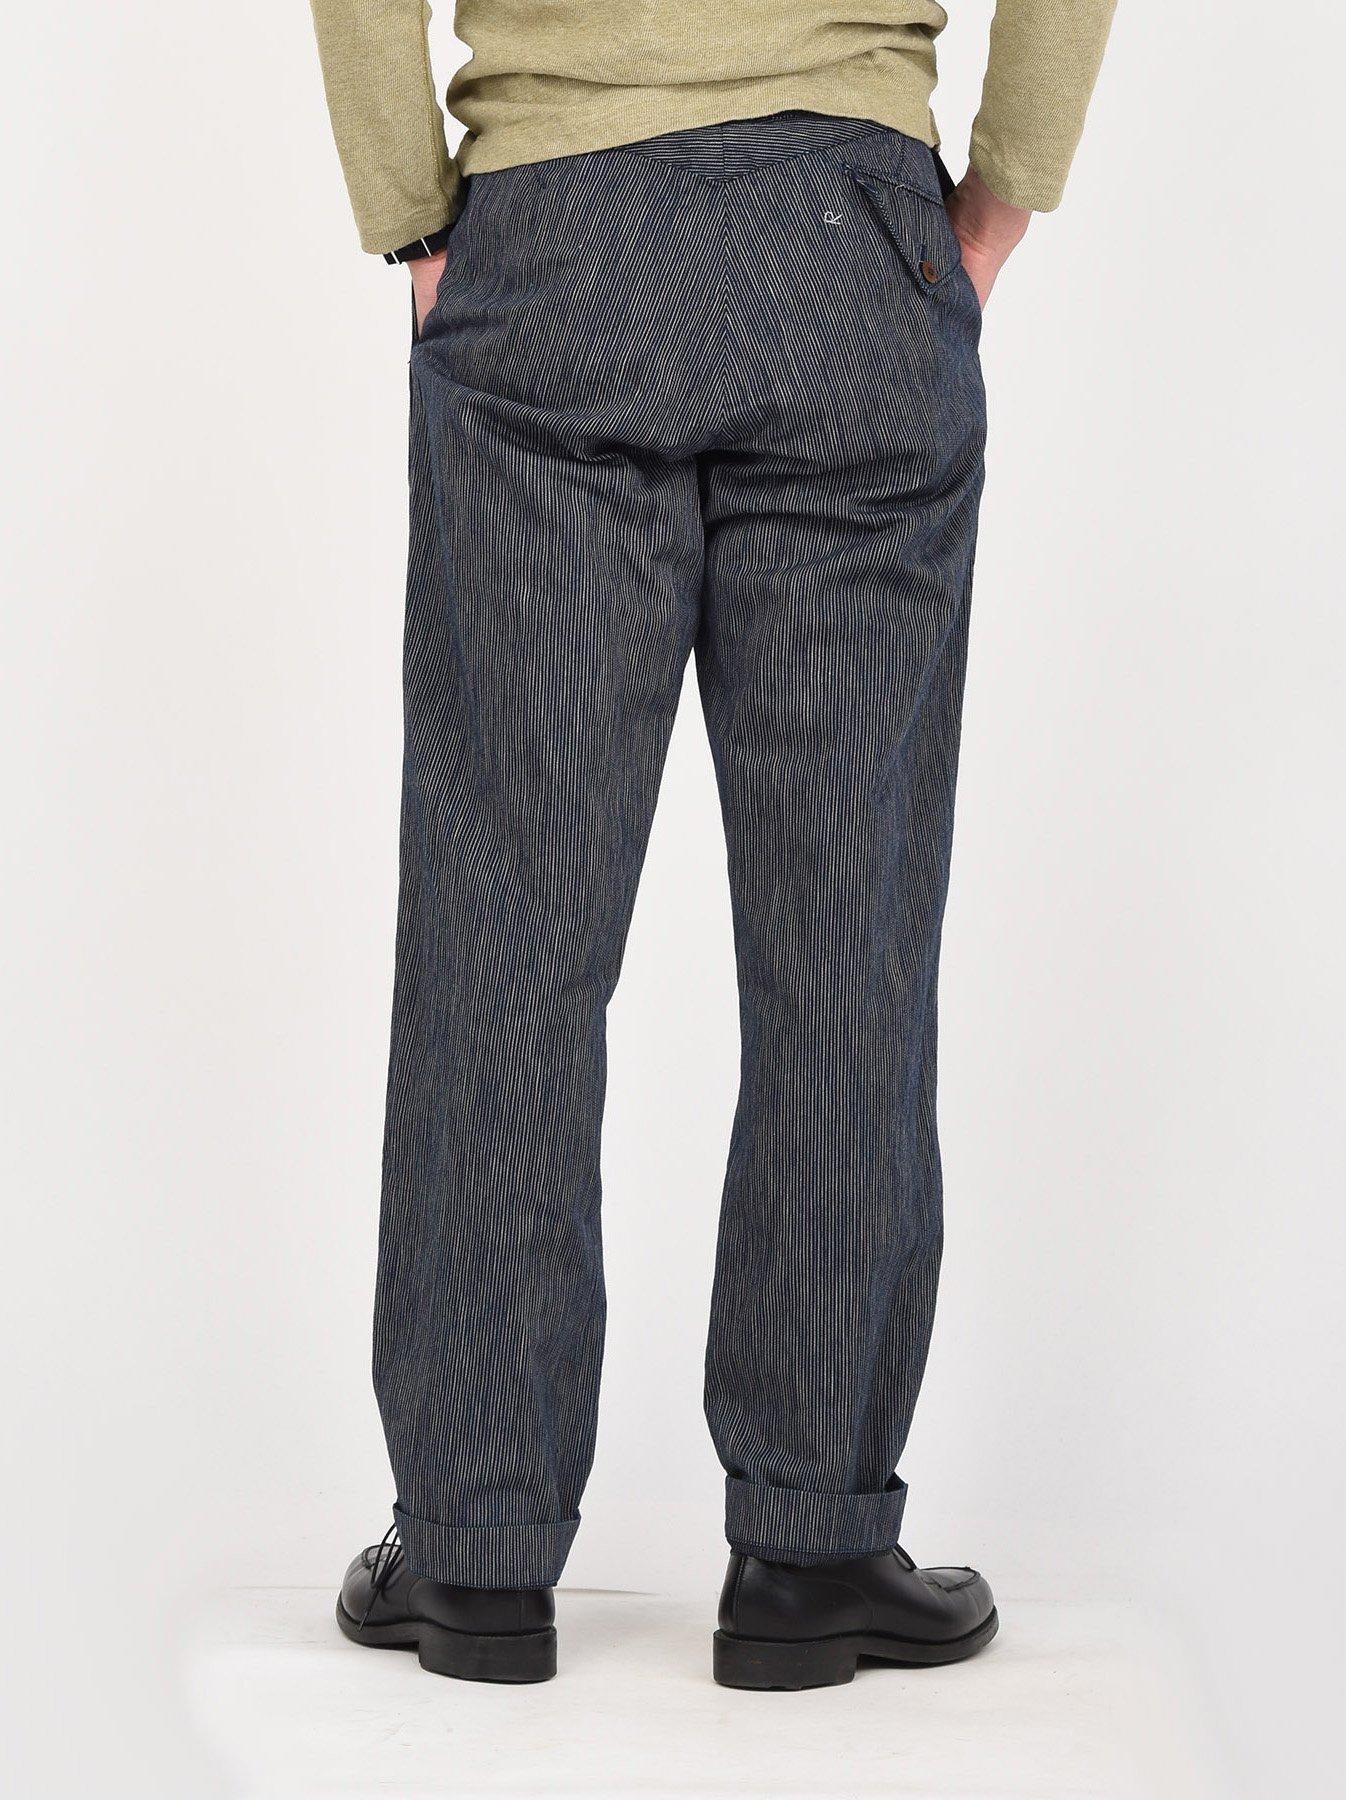 WH Indigo Mugi Yoko-shusi Work Pants-5